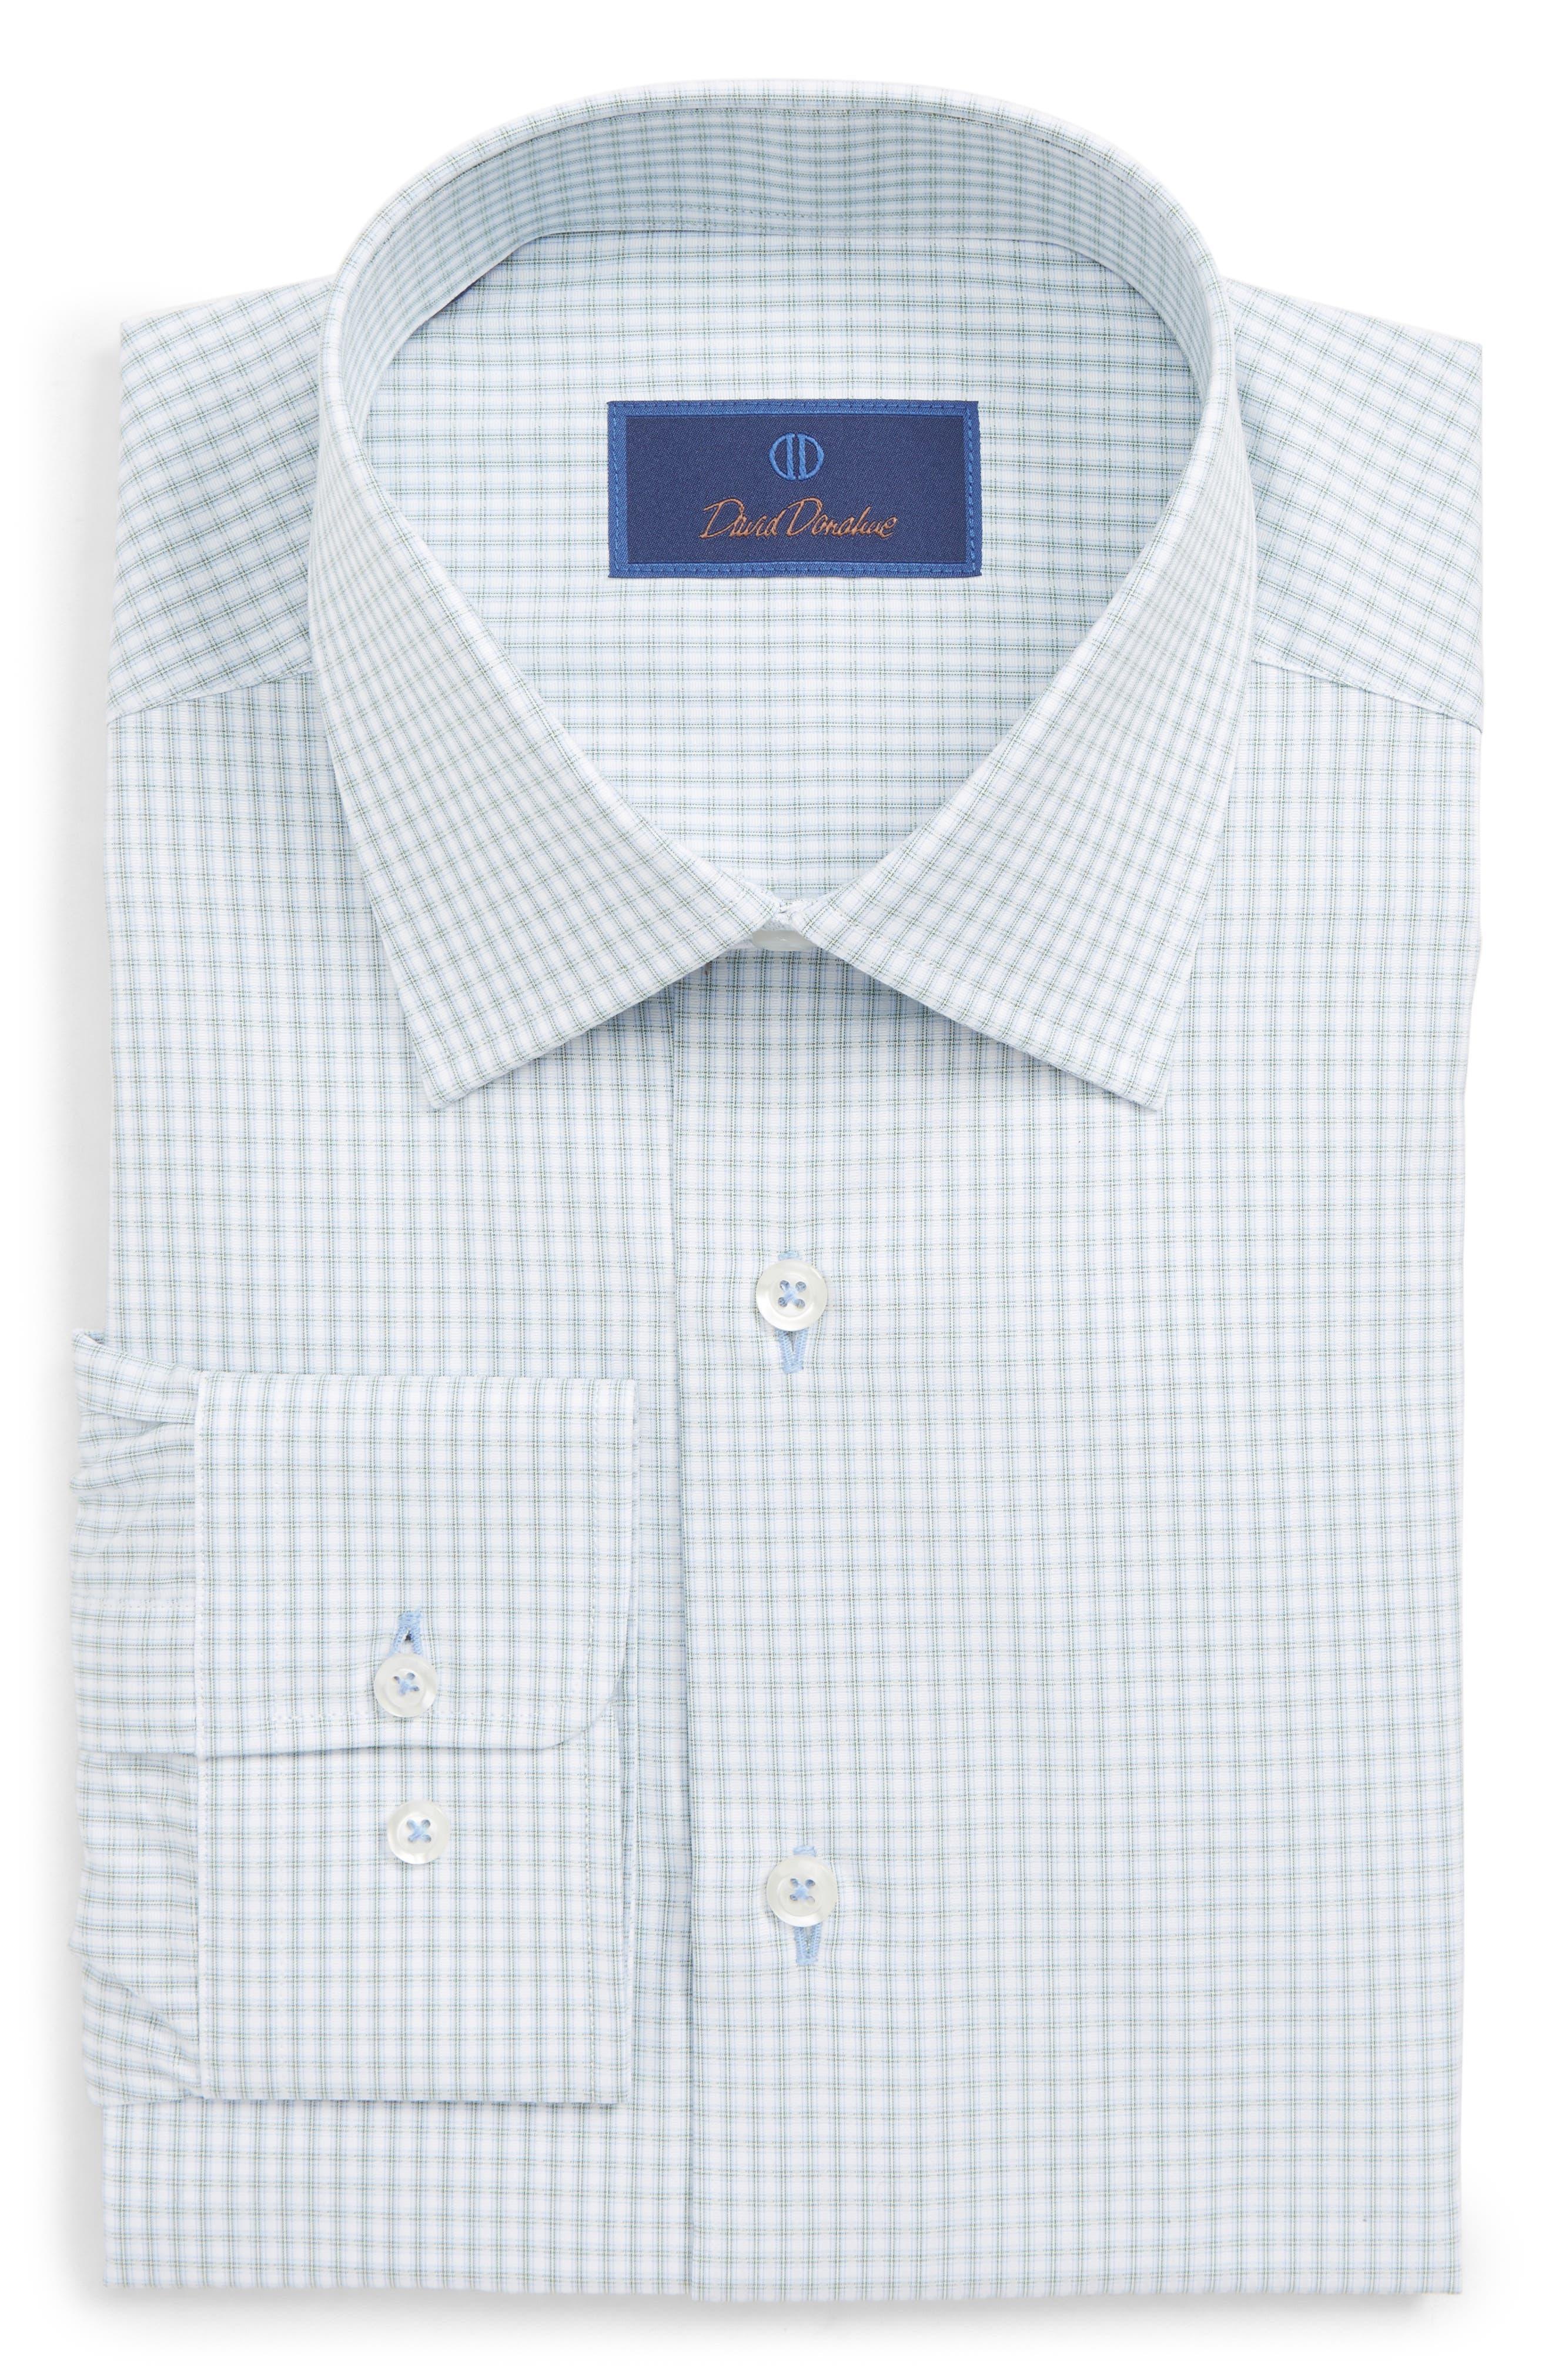 DAVID DONAHUE Men'S Regular-Fit Textured Plaid Dress Shirt in Grass